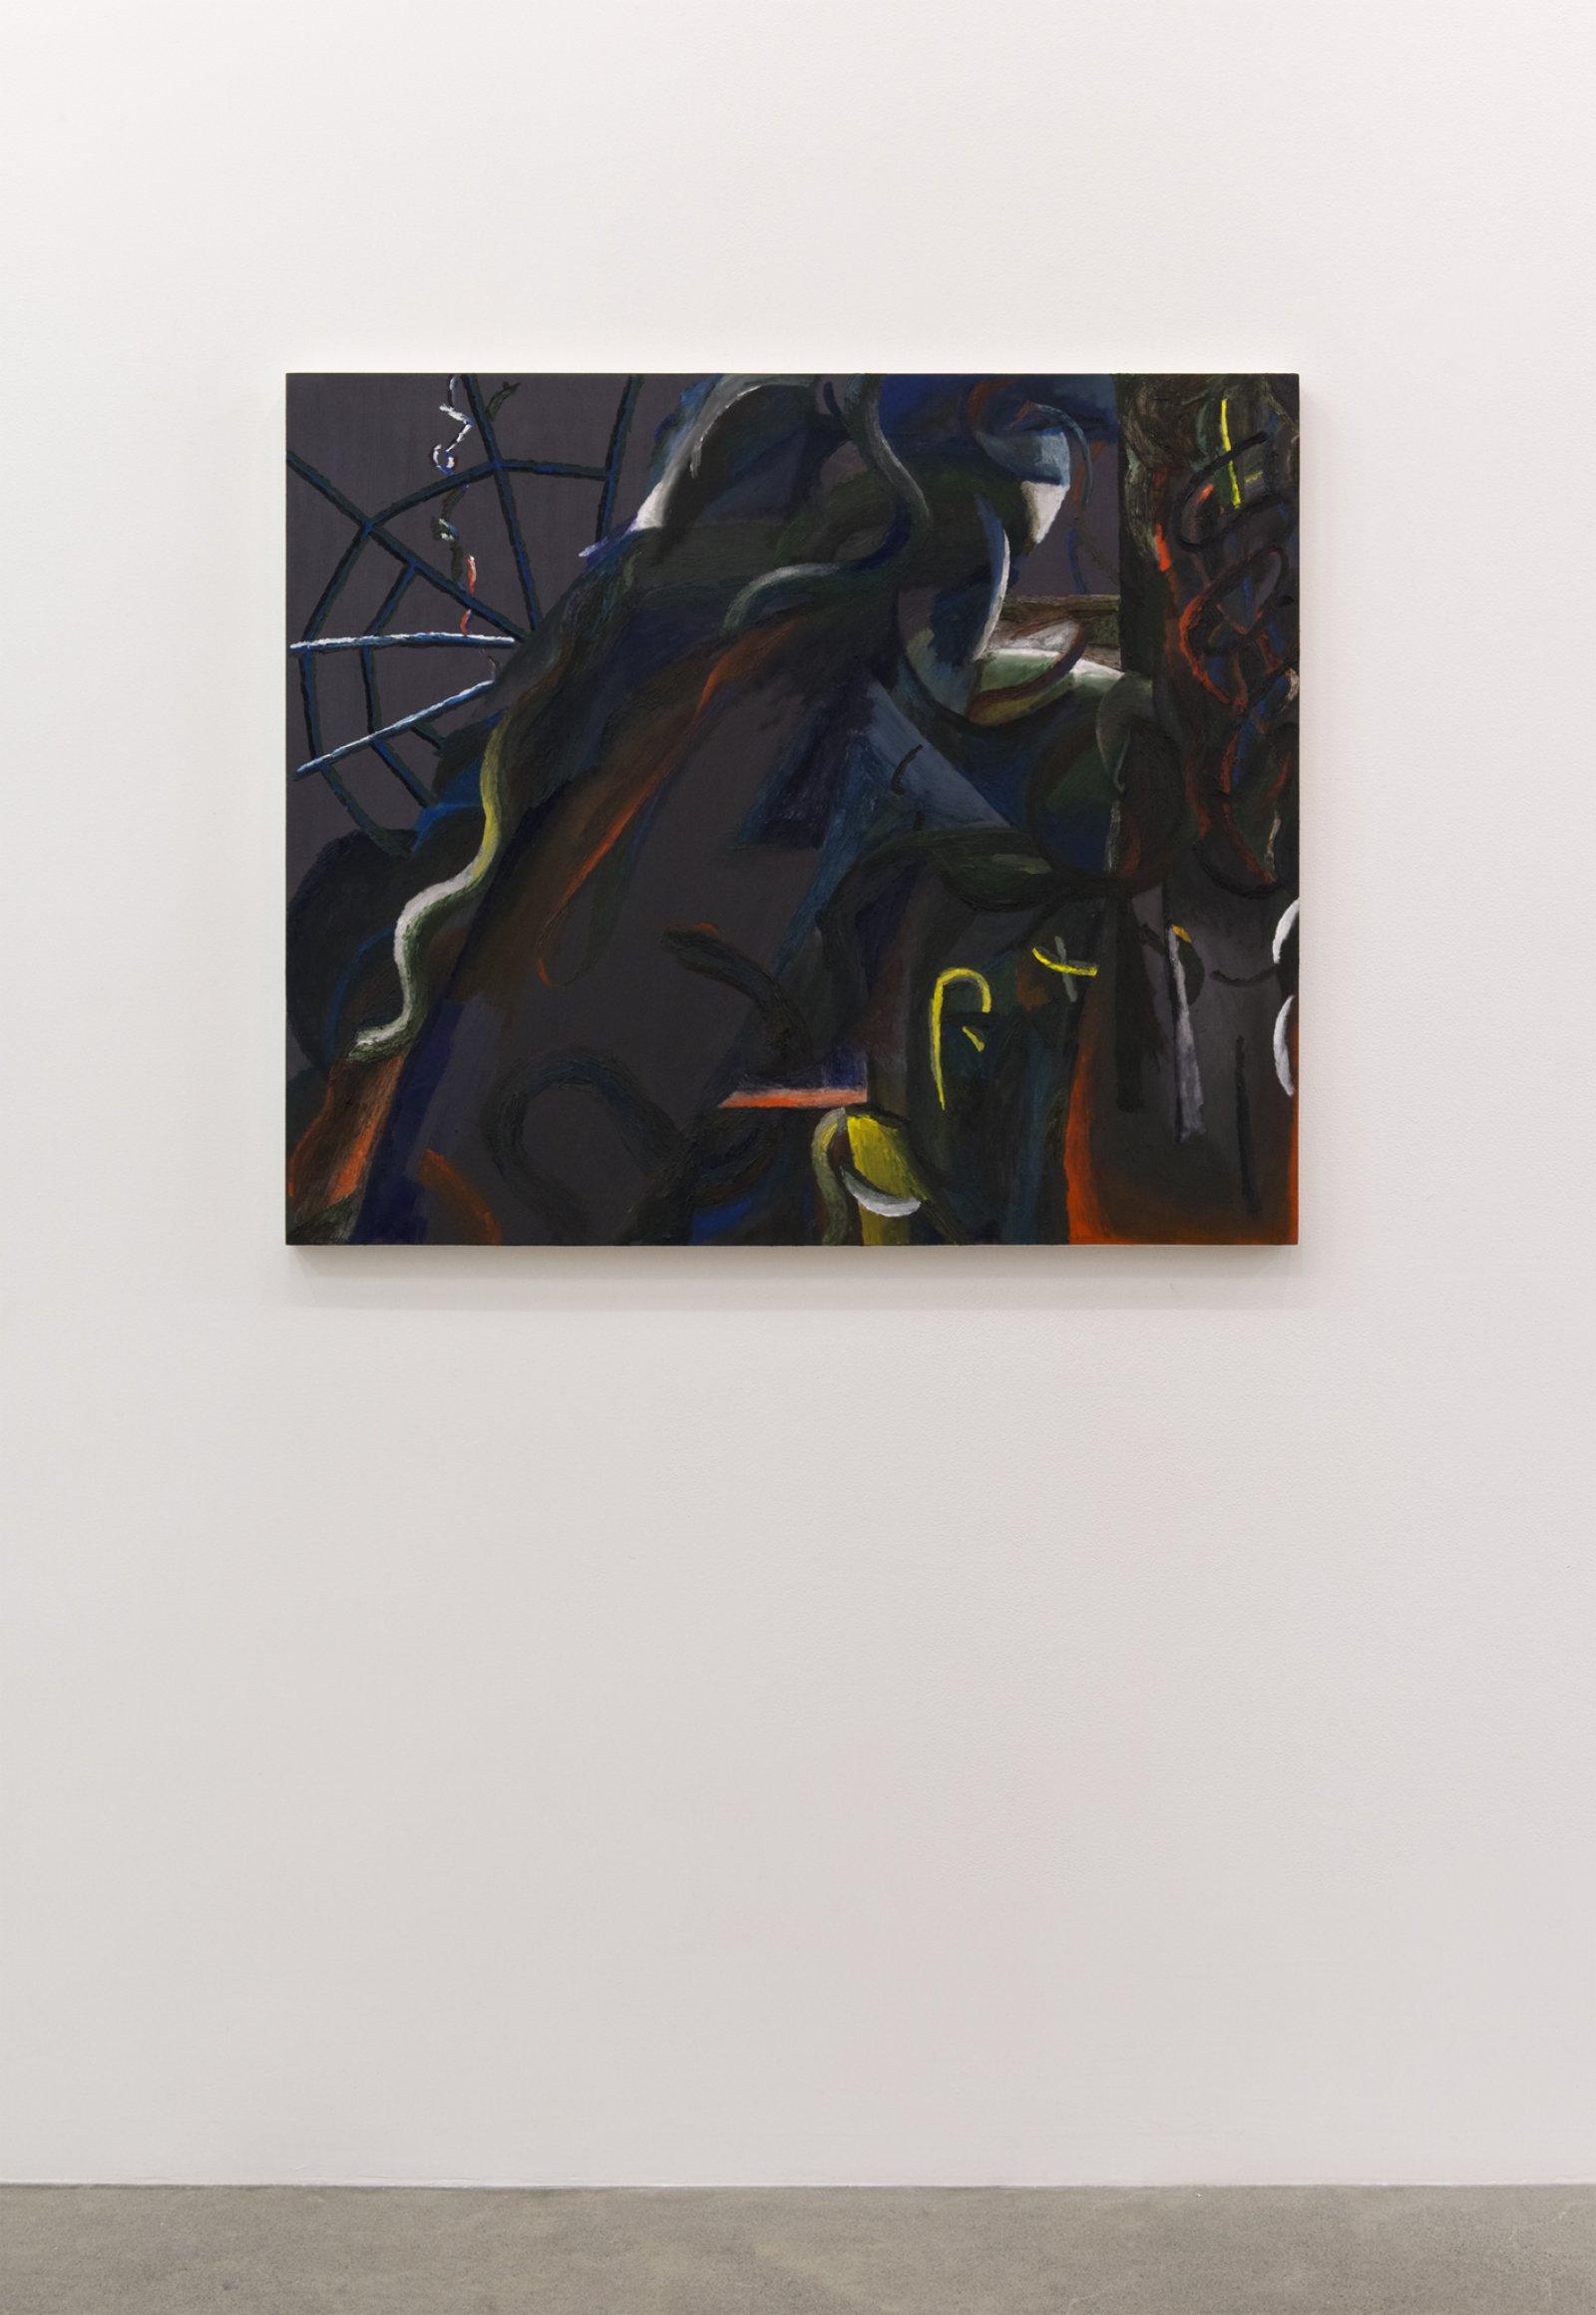 Rebecca Brewer, La Bafana, 2015–2016, oil on muslin on panel, 36 x 42 in. (92 x 107 cm) by Rebecca Brewer